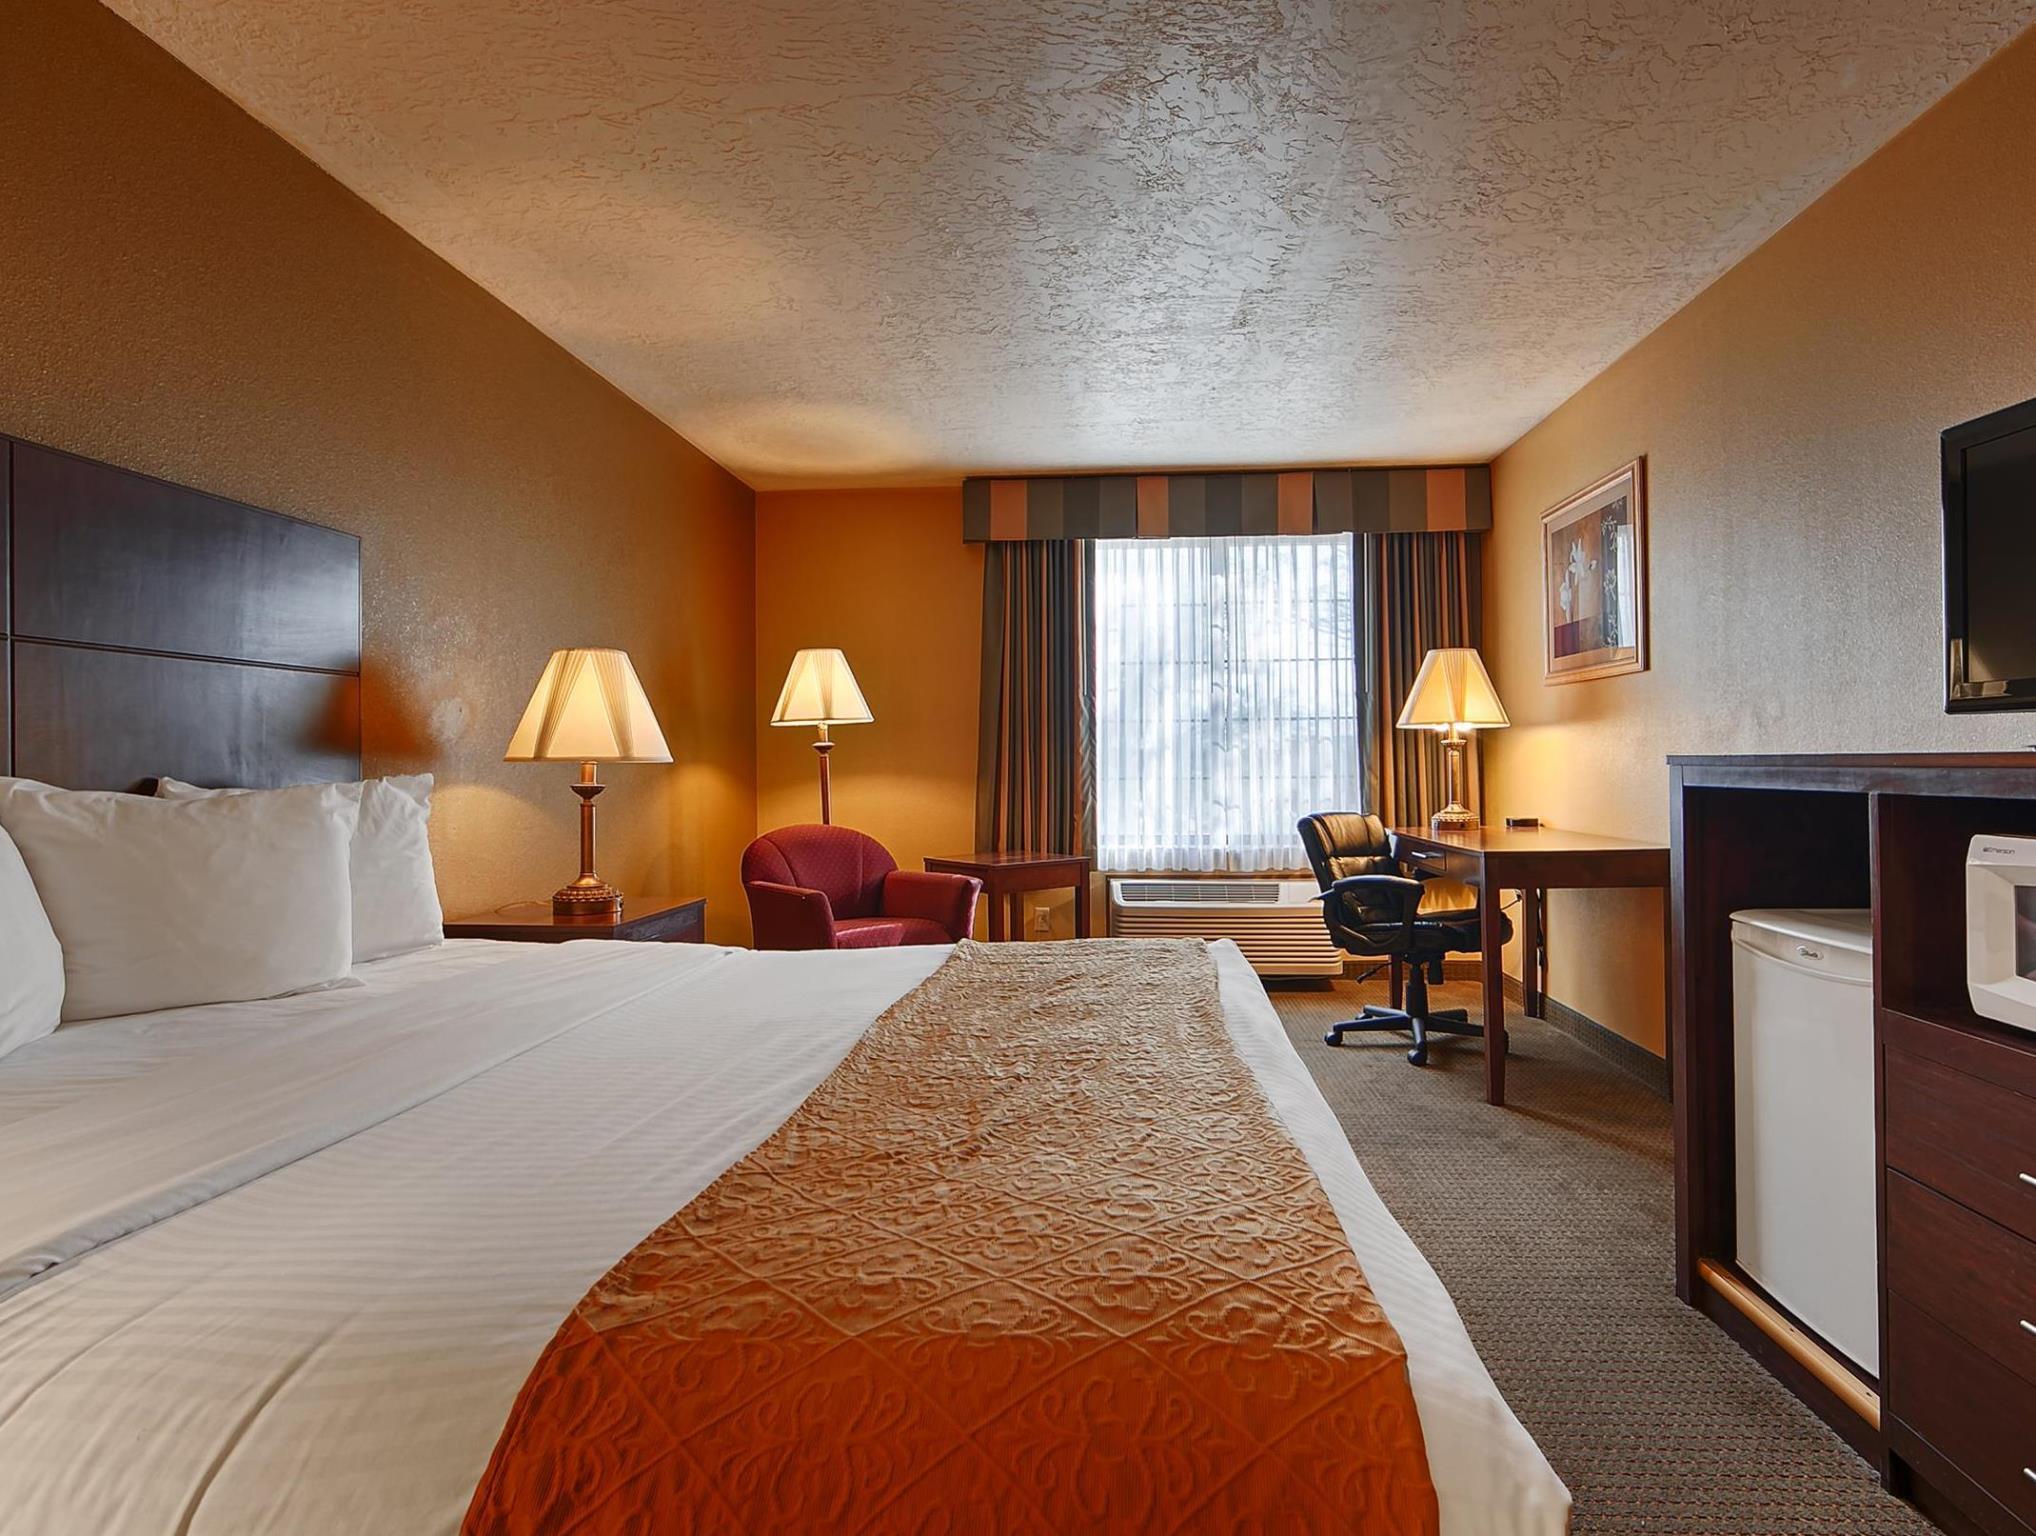 en beds prescott comfort inn comforter queen hotels az greentree official site valley green